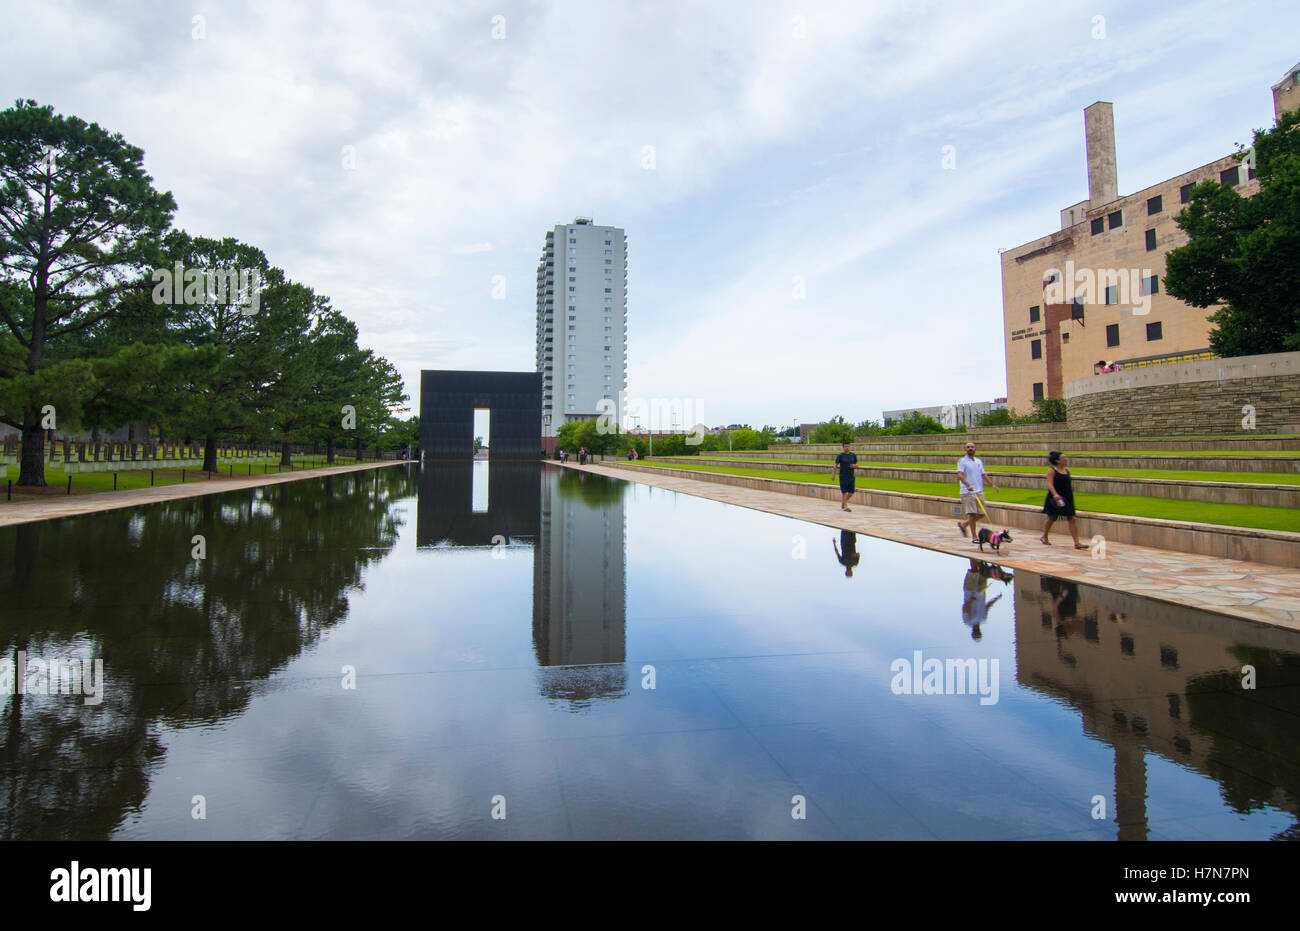 Oklahoma City Oklahoma OK, OKC, historical disaster OKC bombing reflection lake at OKC Bombing Memorial that happened - Stock Image